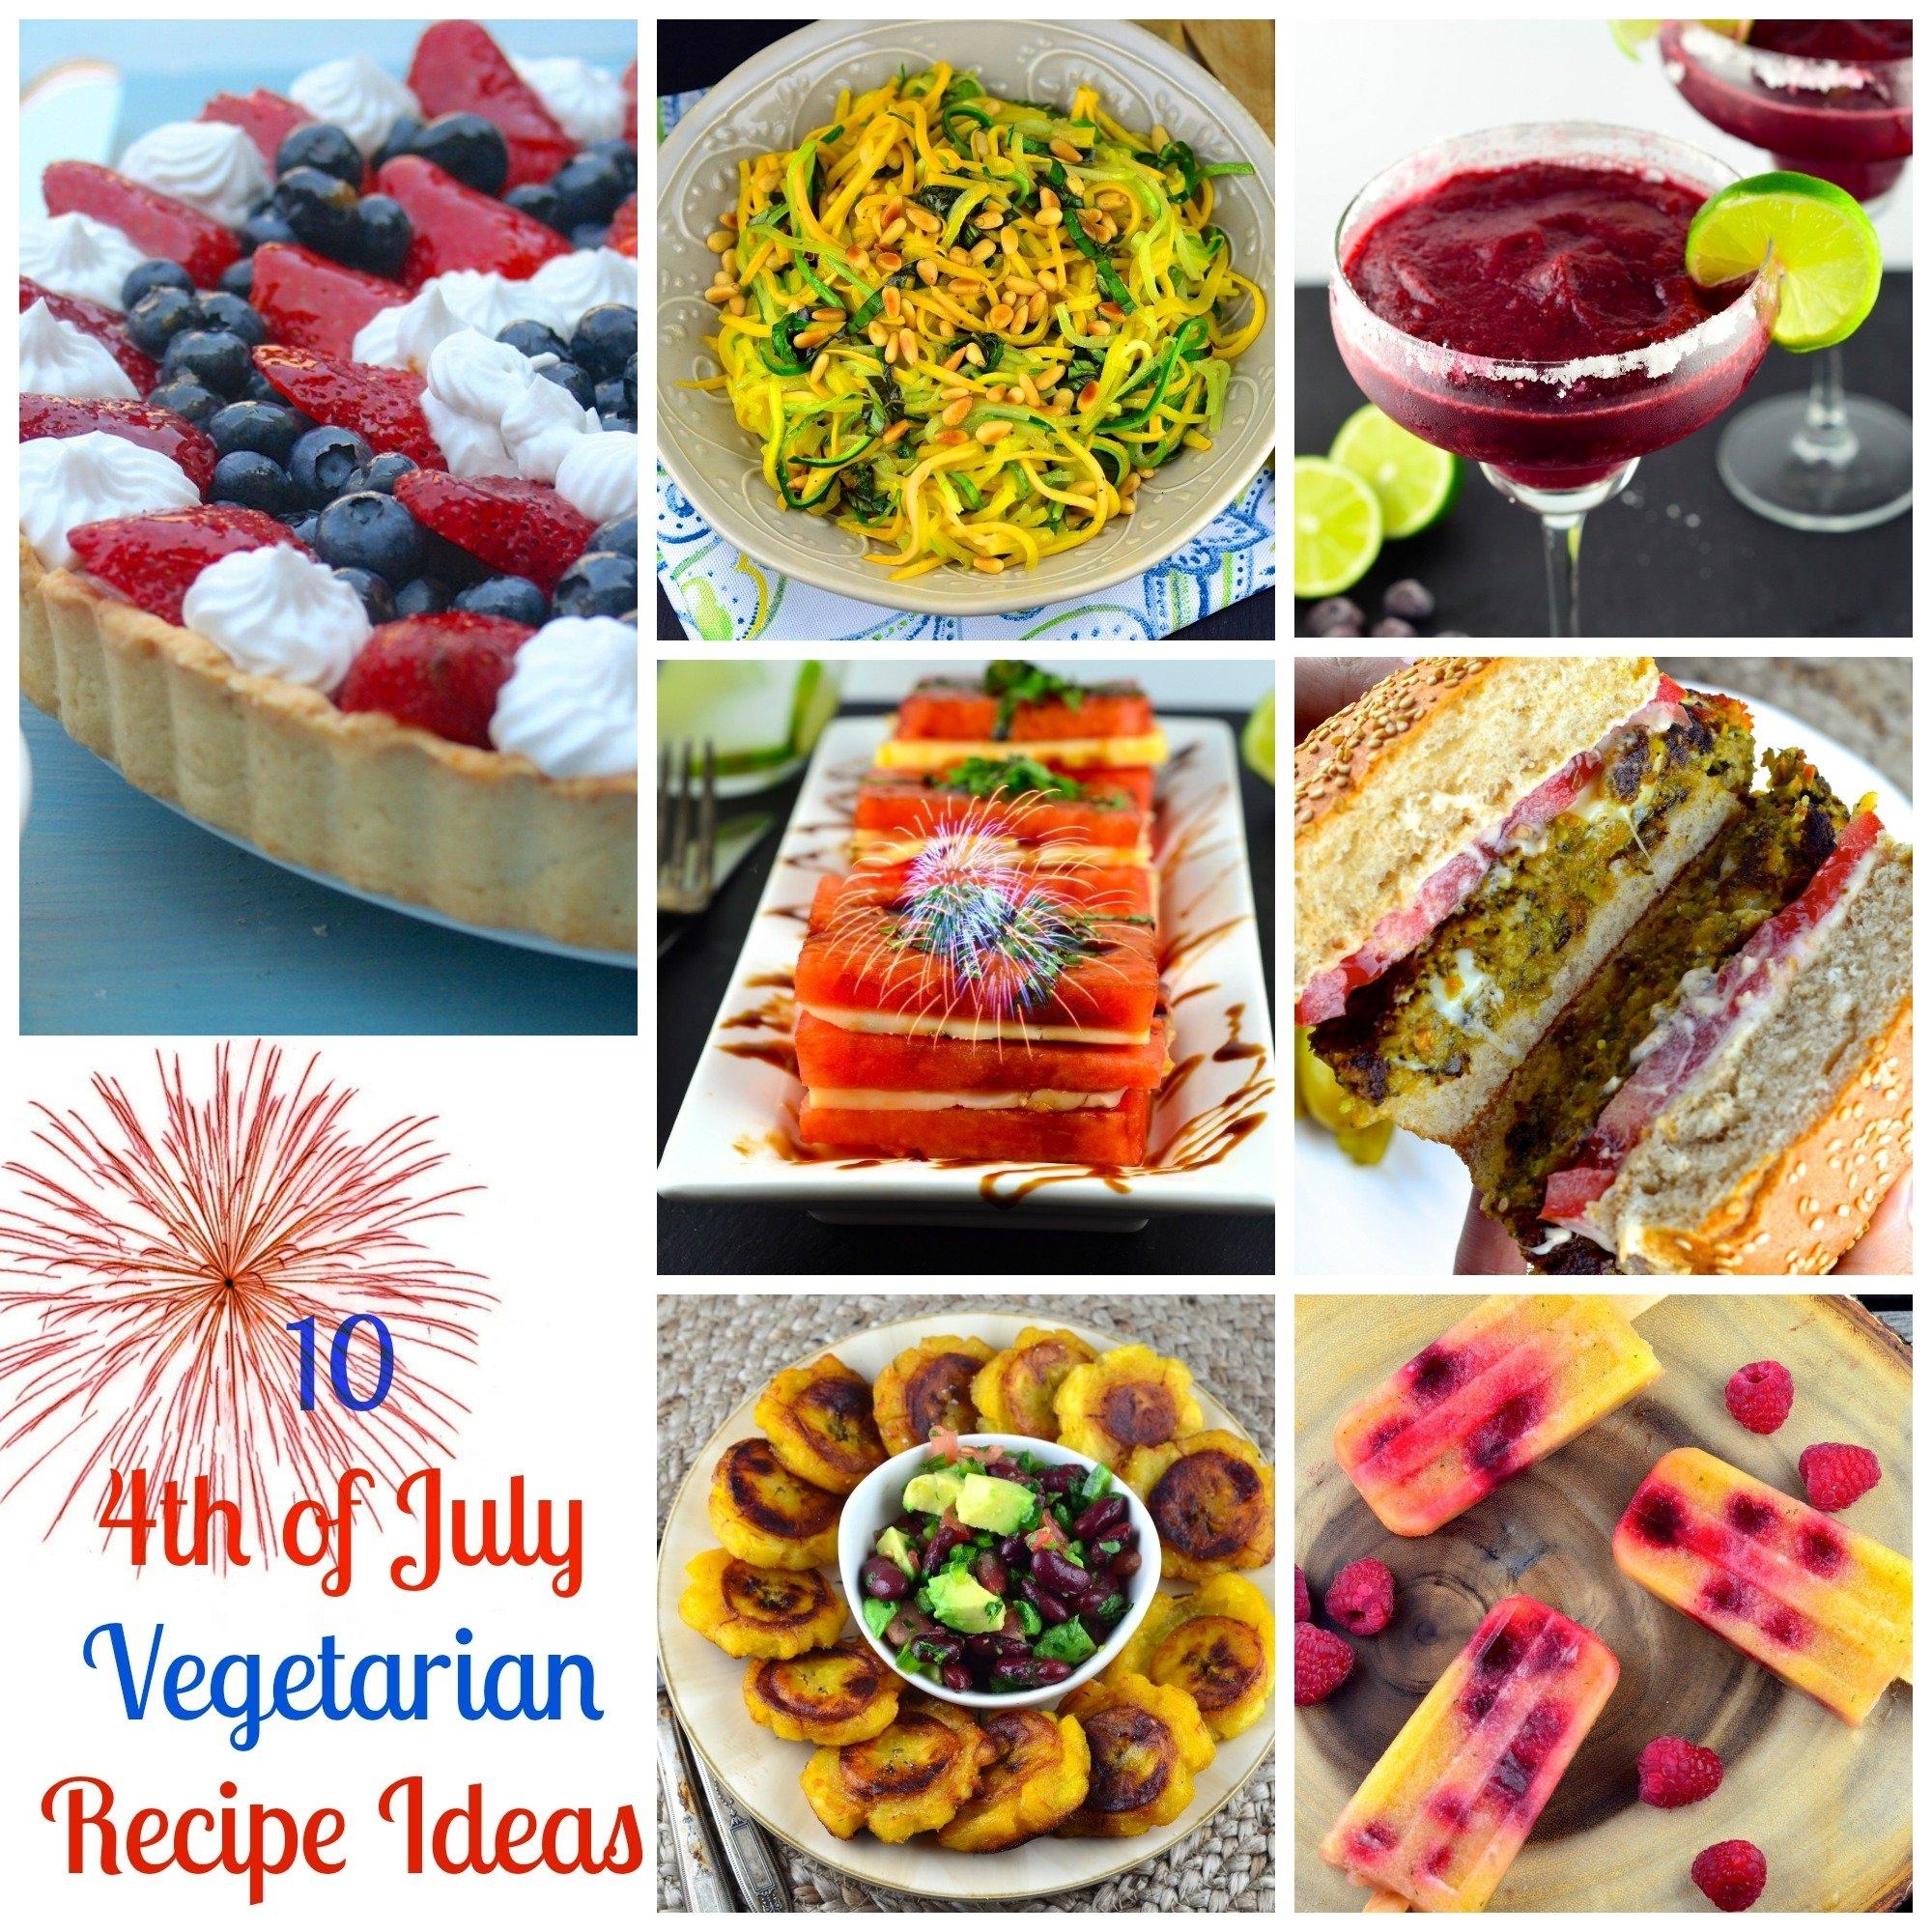 10 Beautiful Fourth Of July Menu Ideas ten 4th of july vegetarian recipe ideas 6 2021